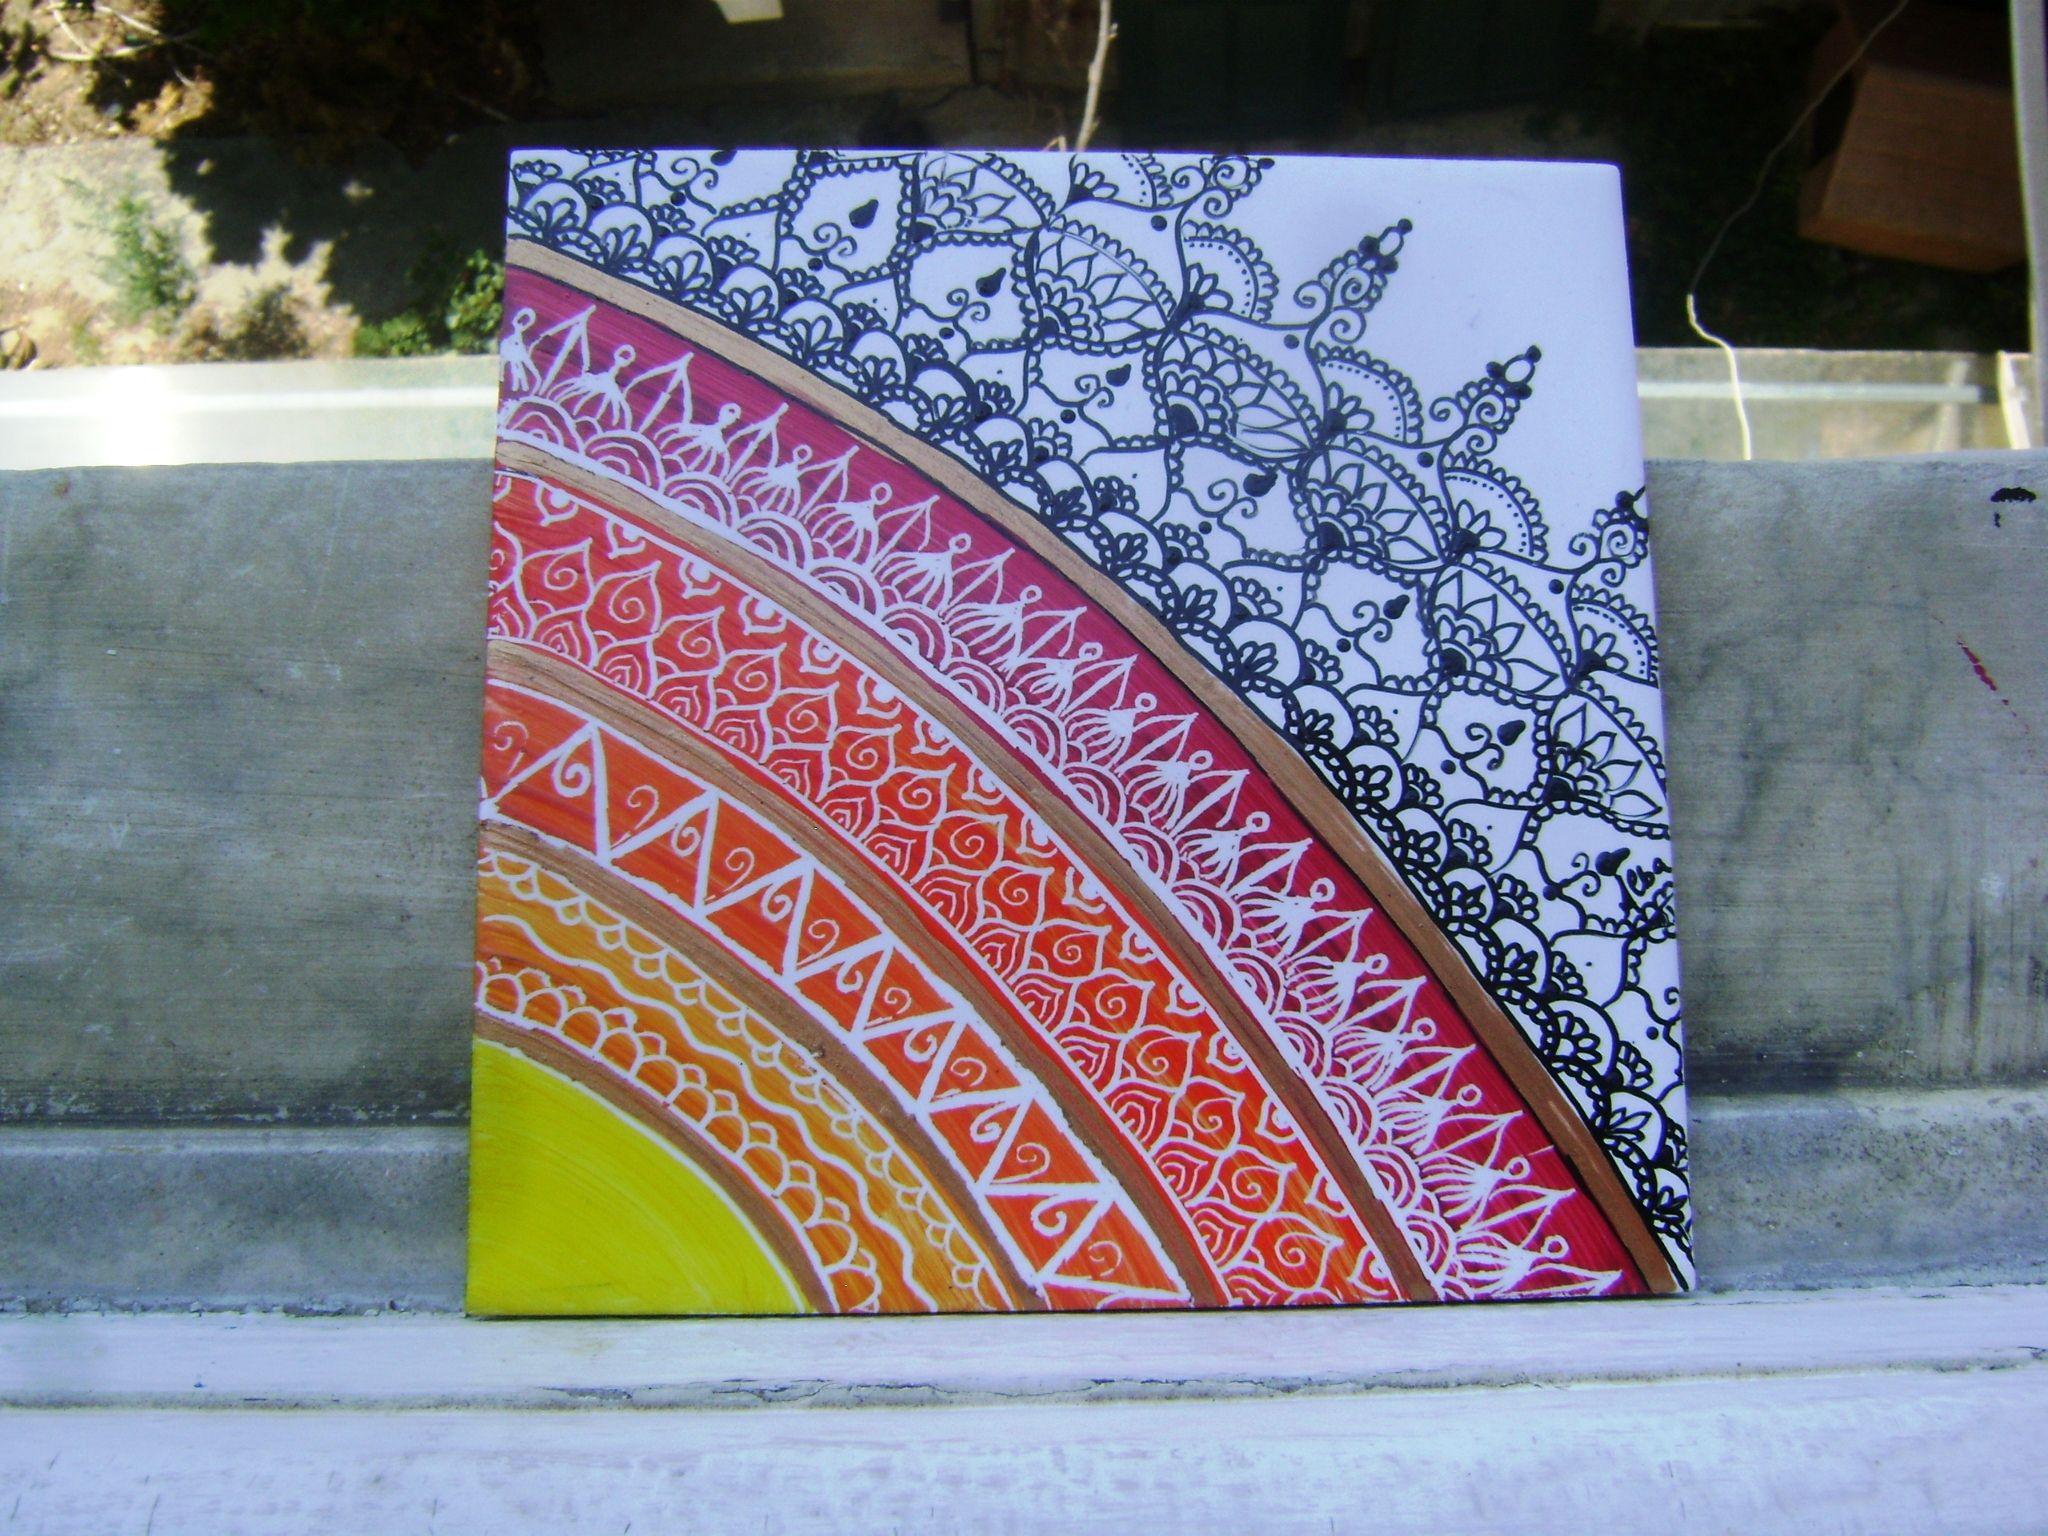 Pittura Su Piastrelle Di Ceramica : Mandala su piastrella piastrelle dipinte a mano piastrelle